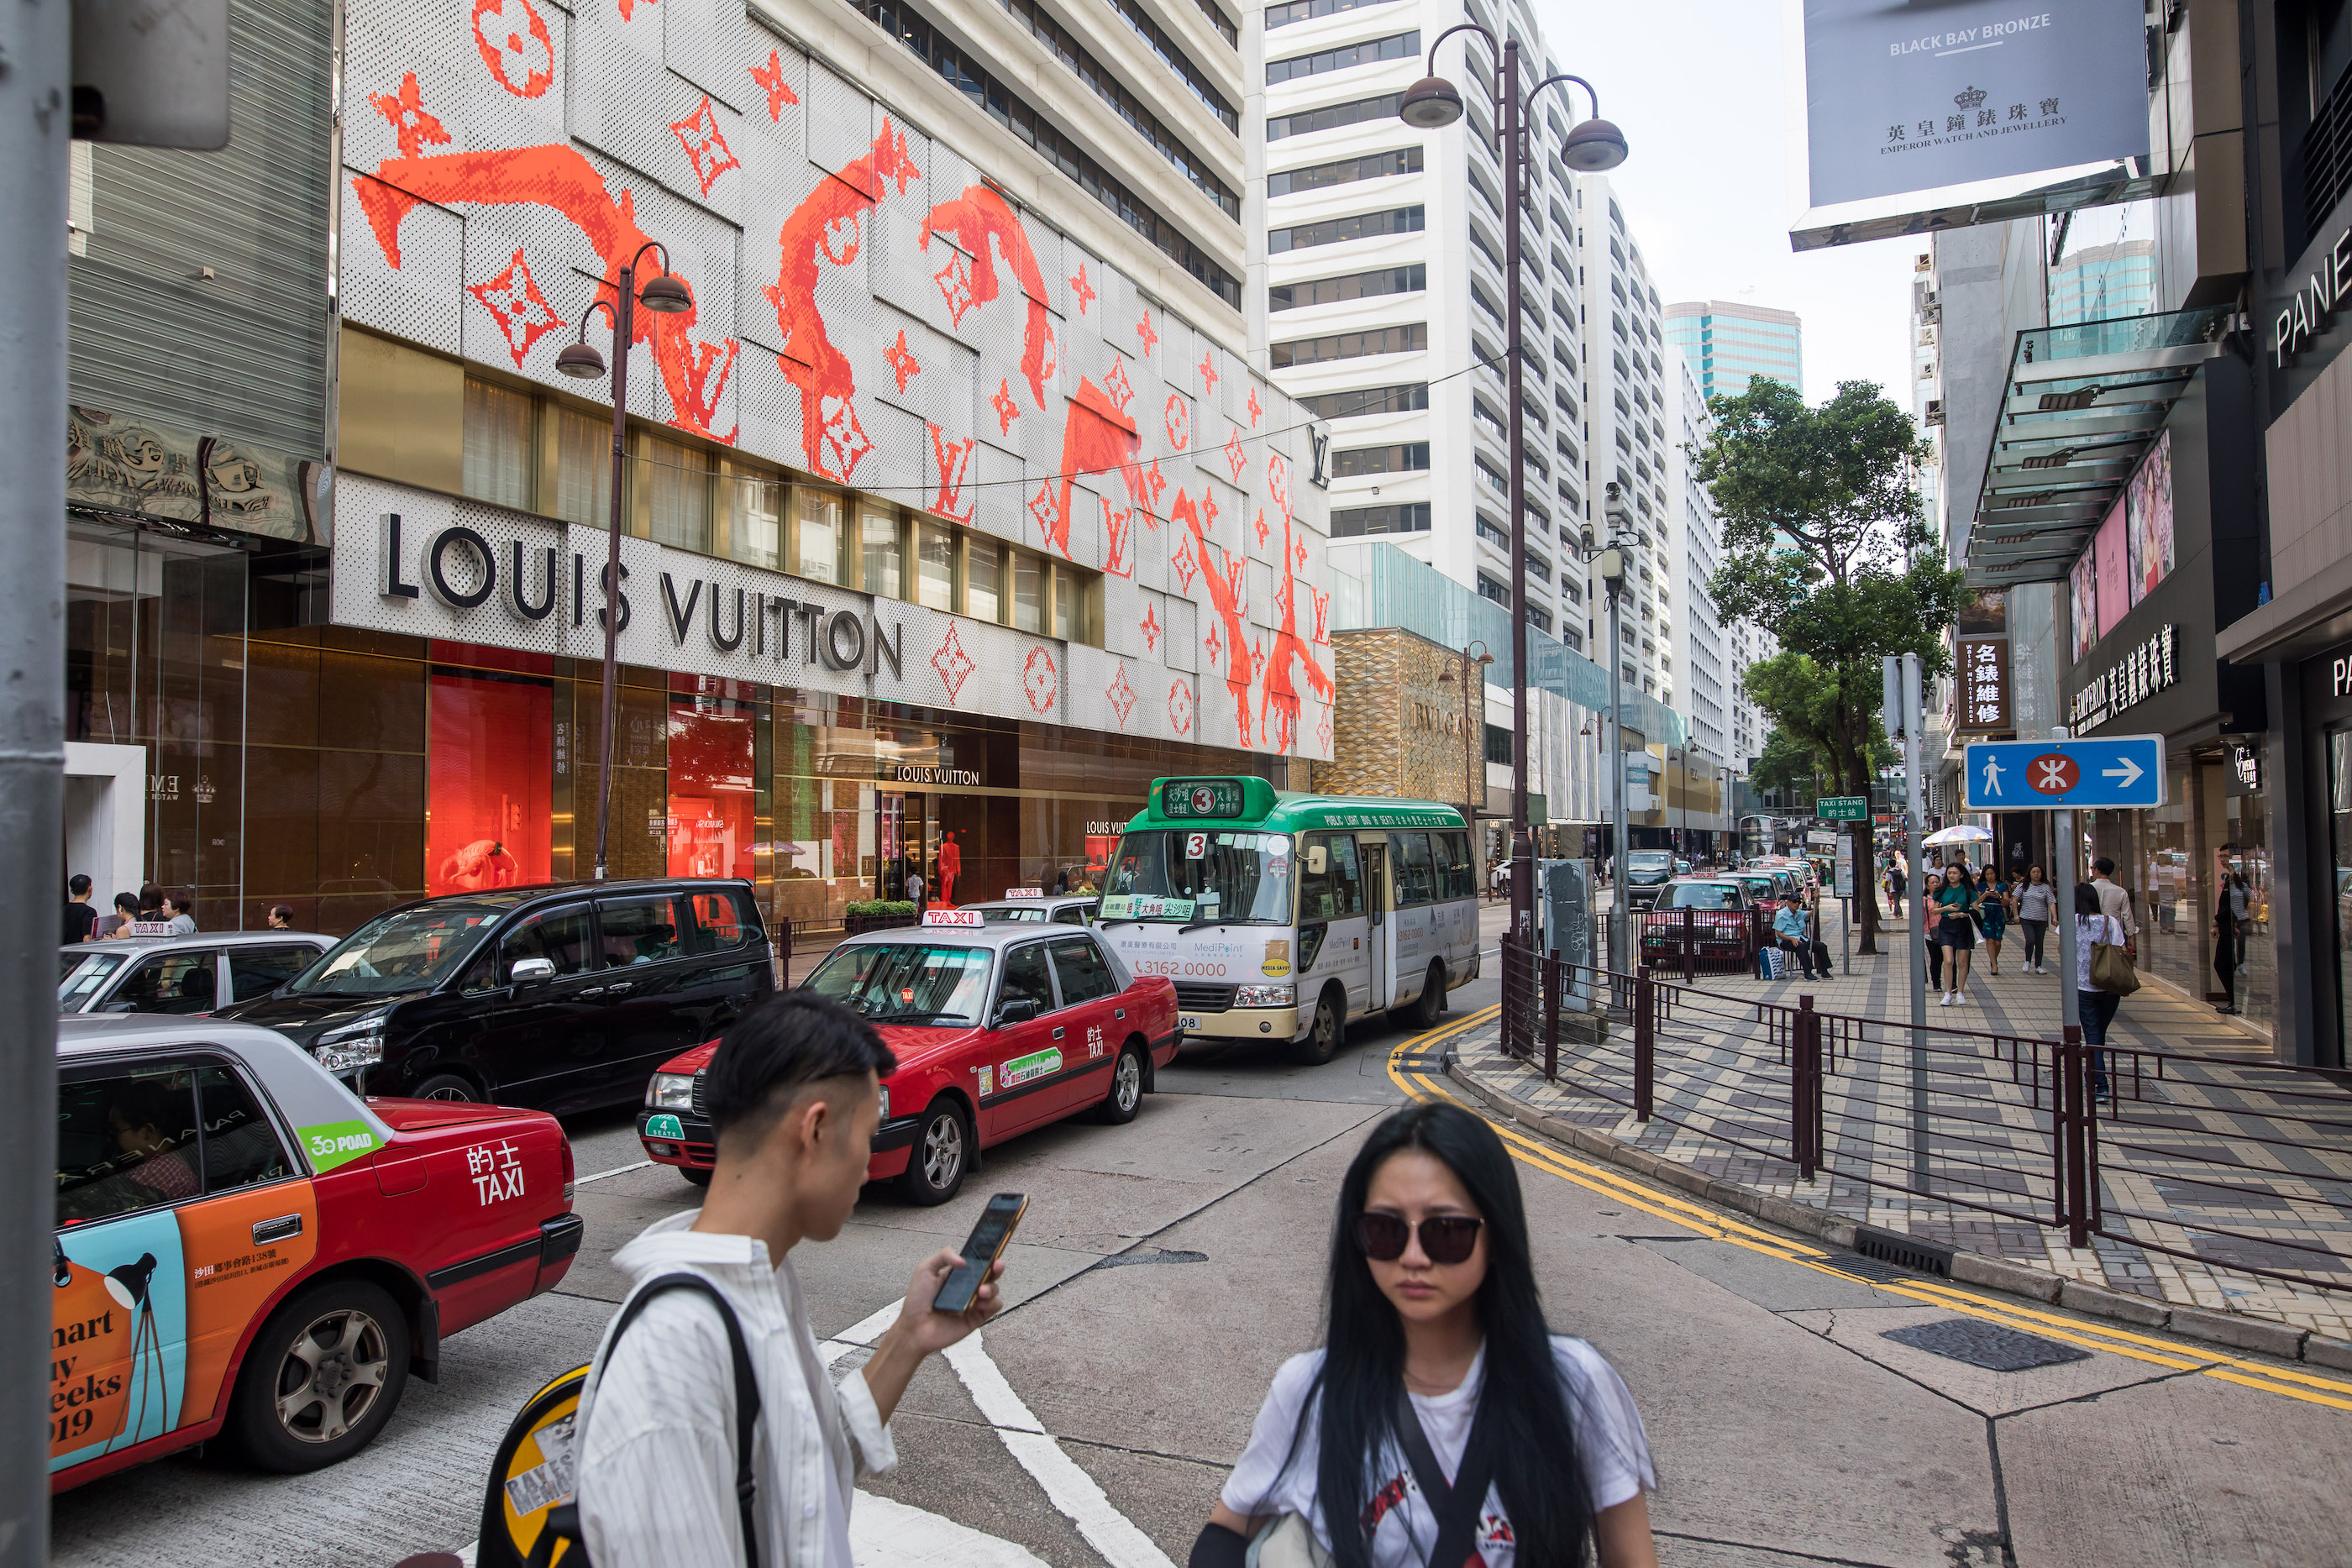 Louis Vuitton on Canton Road in the Tsim Sha Tsui district of Hong Kong, China.